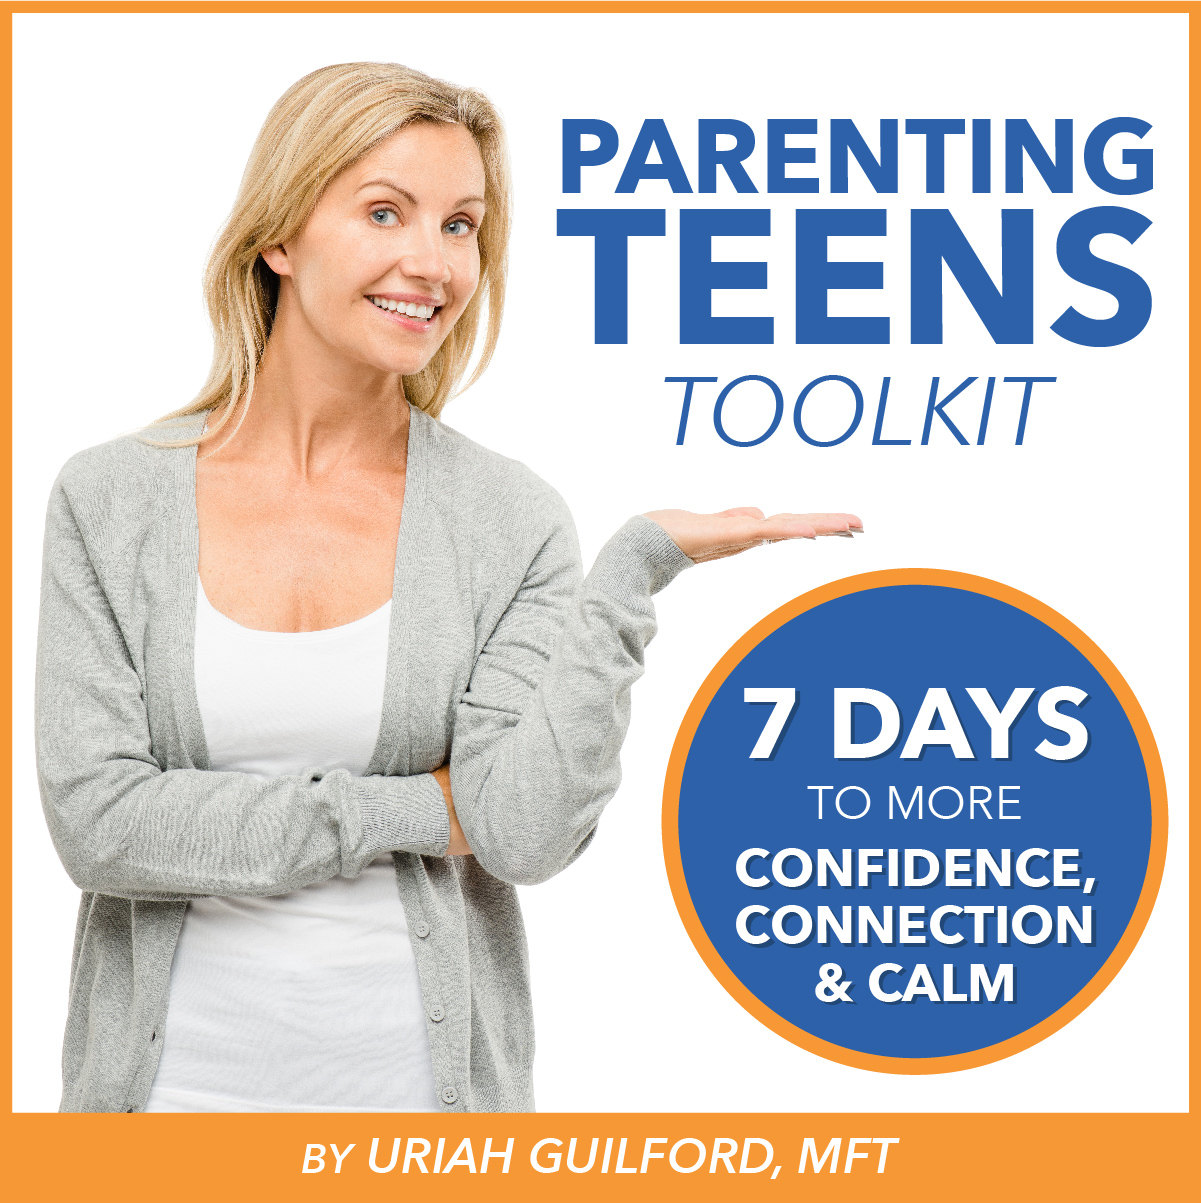 Parenting Teens Toolkit